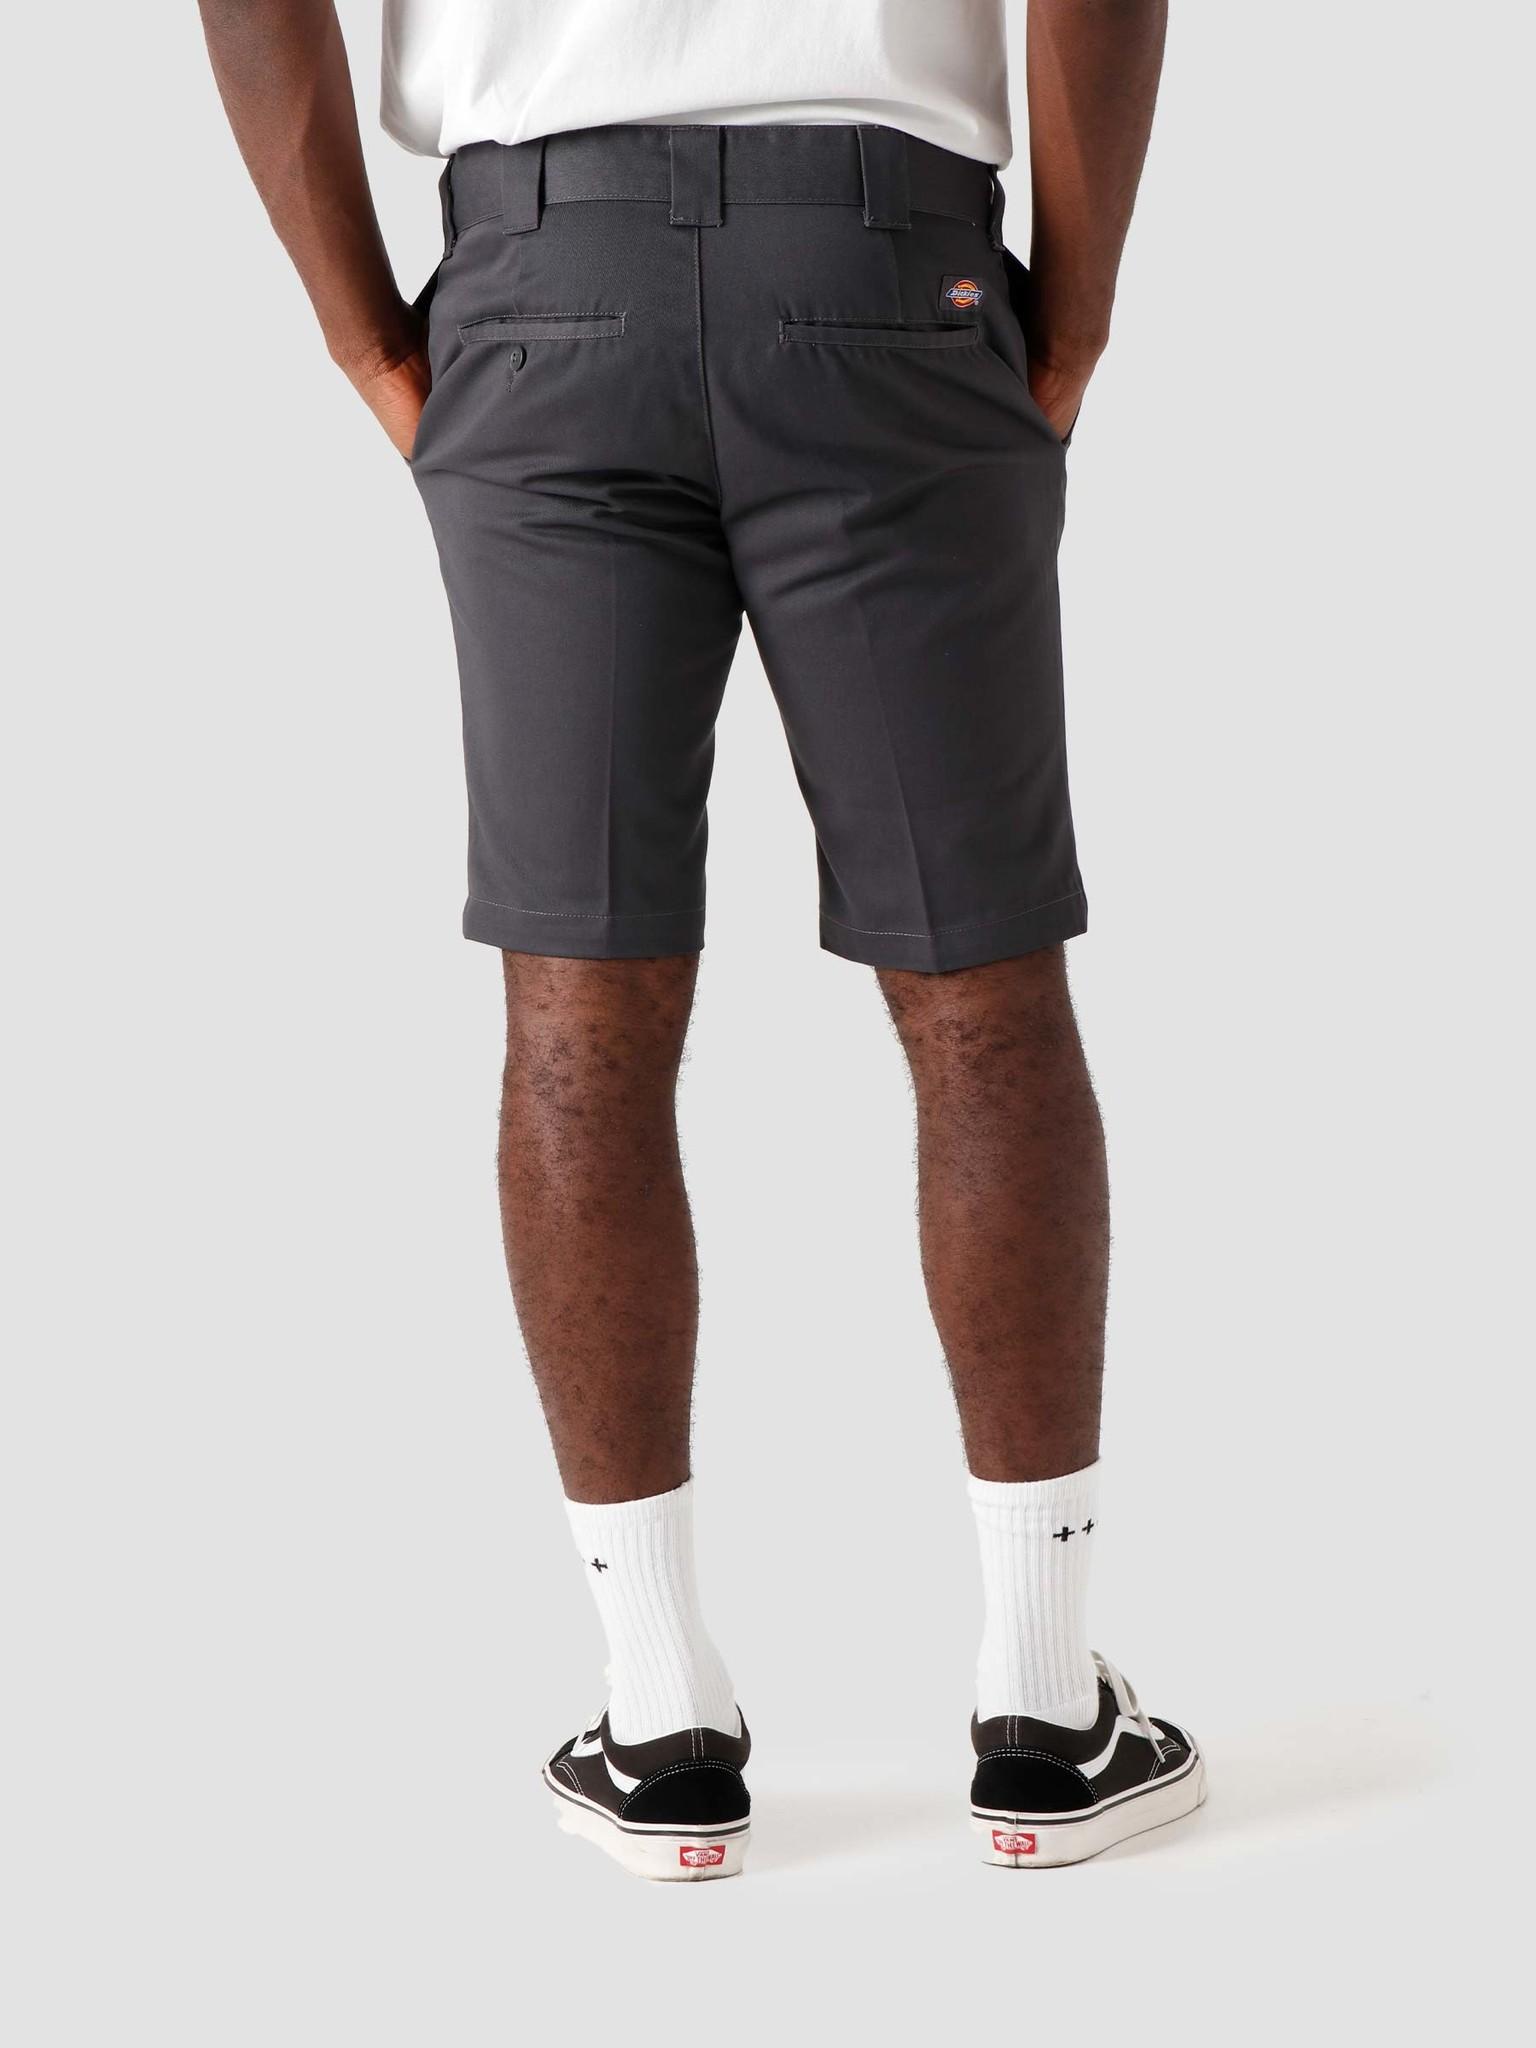 Dickies Dickies Slim Fit Short Charcoal Grey DK0A4XB1CH01